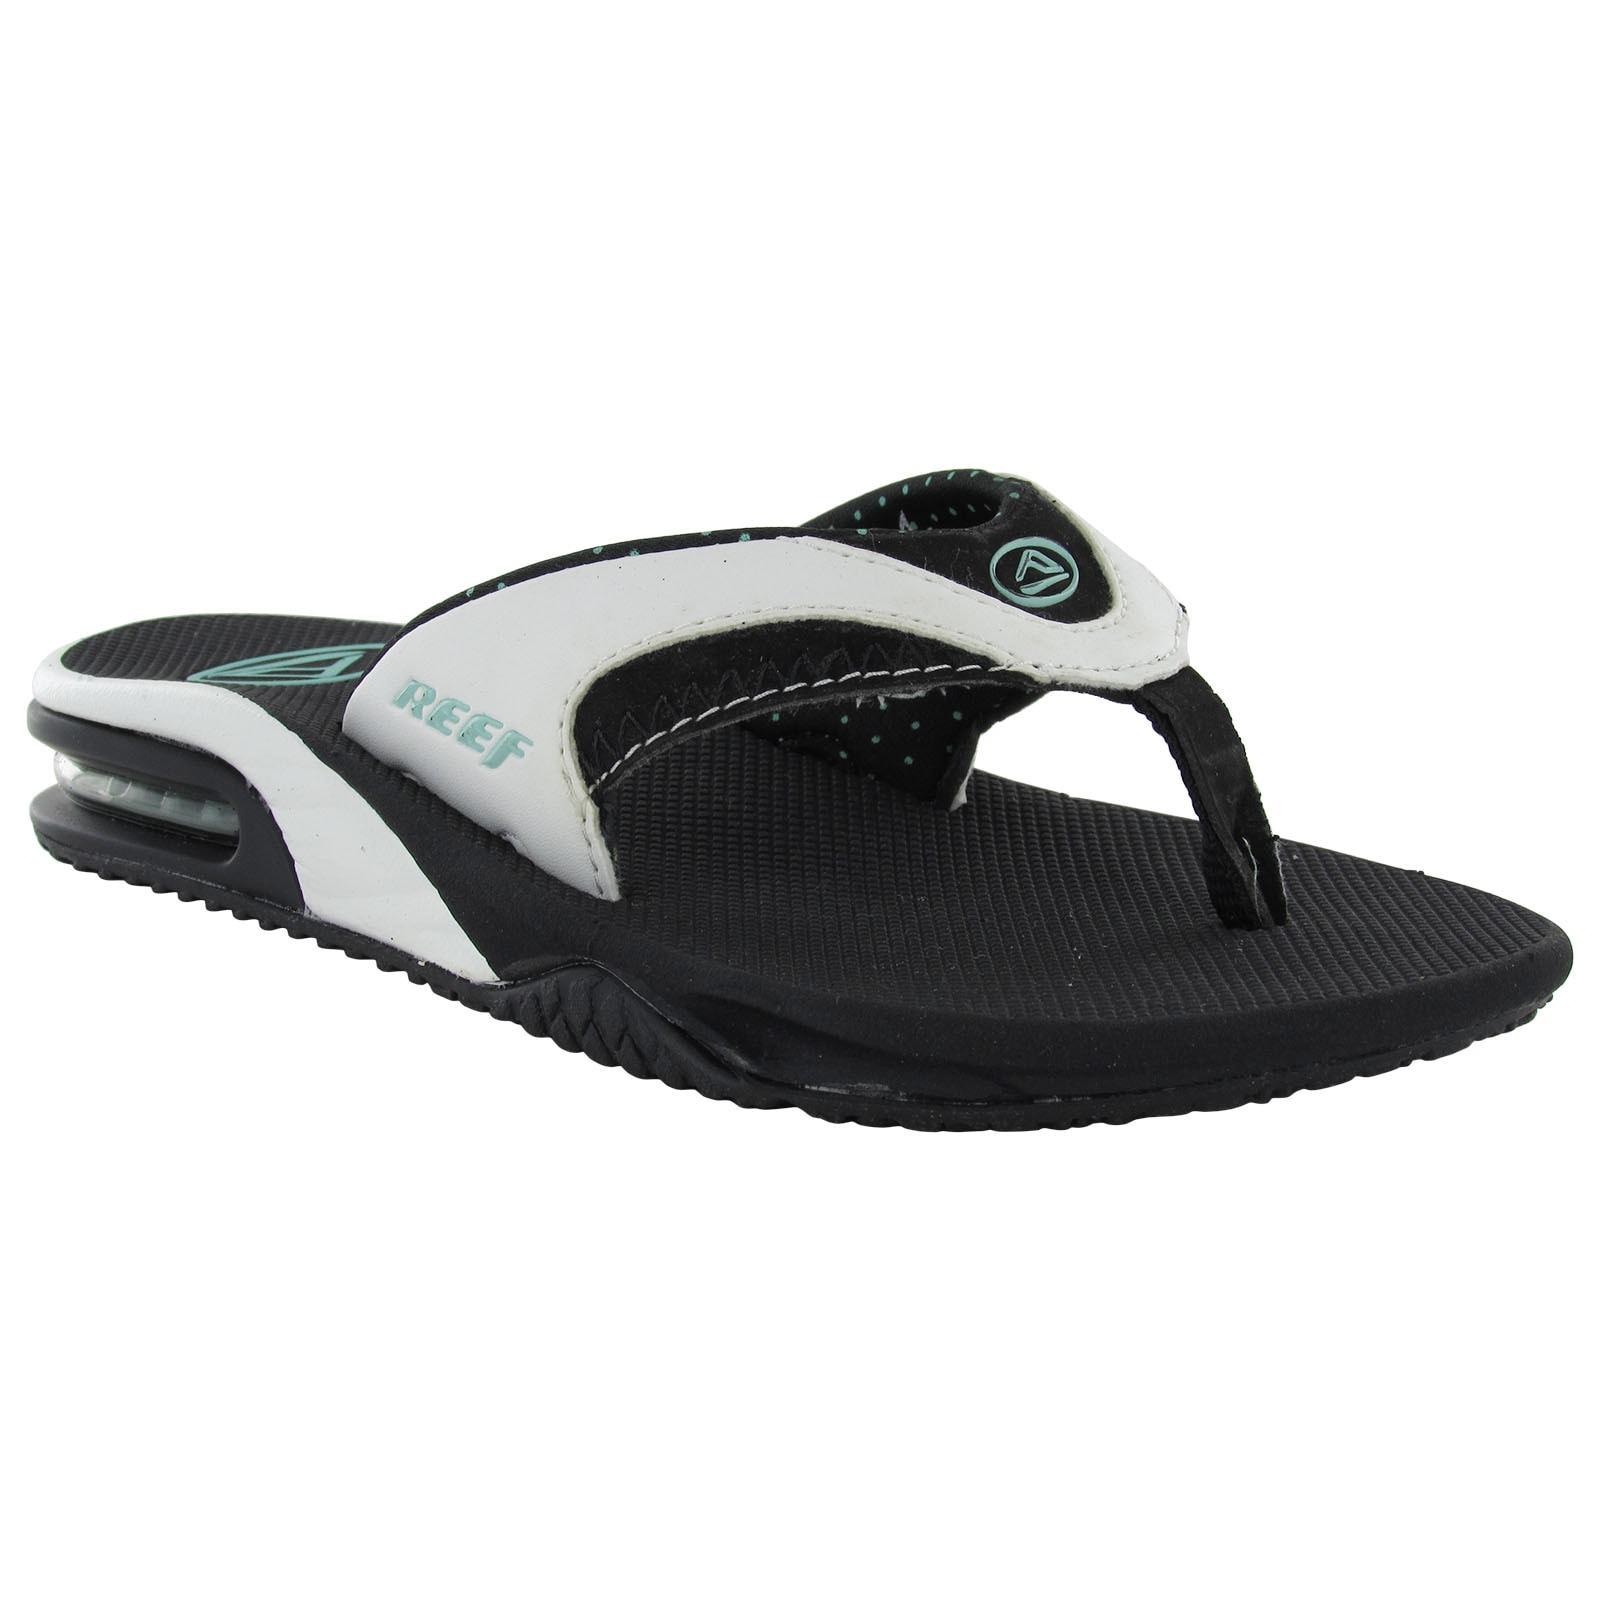 Reef Womens Fanning Flip Flop Sandals (Black/White/Aqua, ...